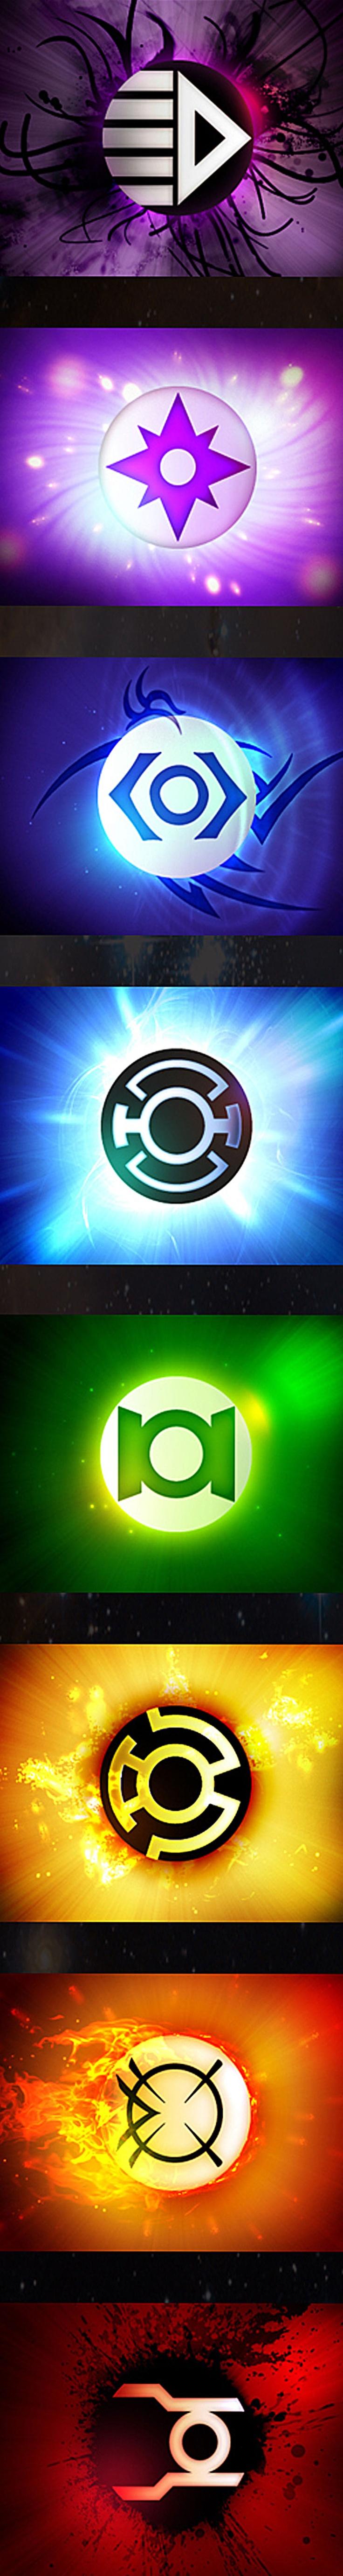 Lantern Corporation